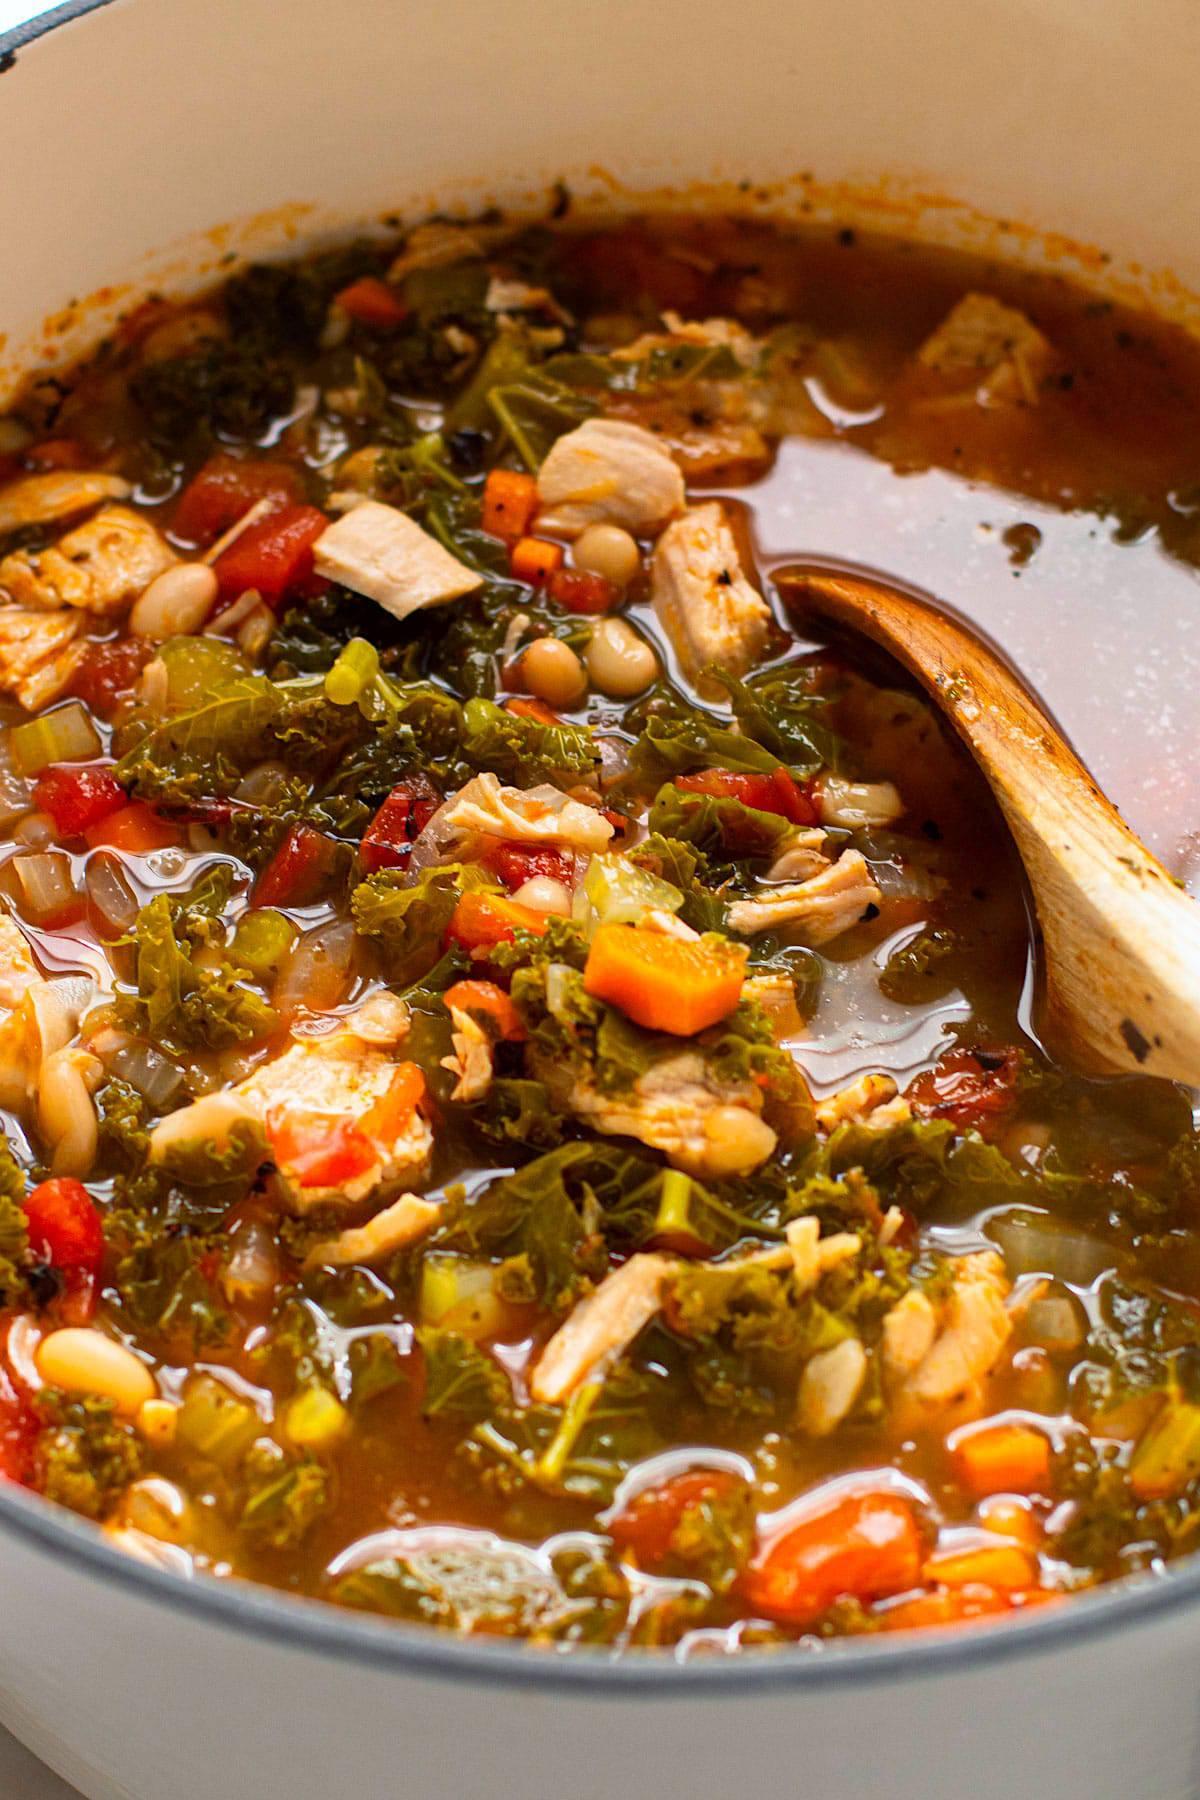 A pot of turkey kale soup.